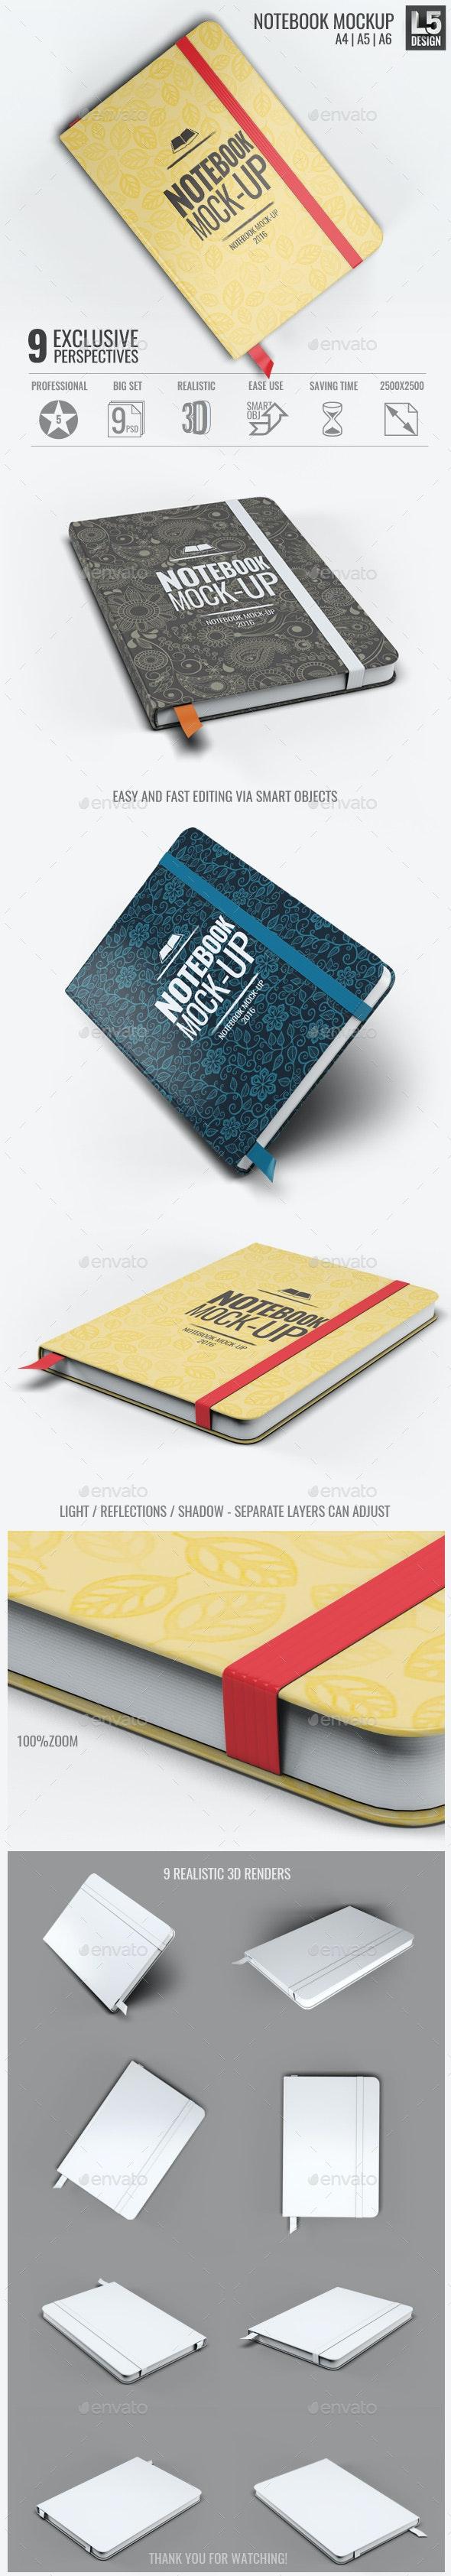 Notebook Mock-Up - Print Product Mock-Ups